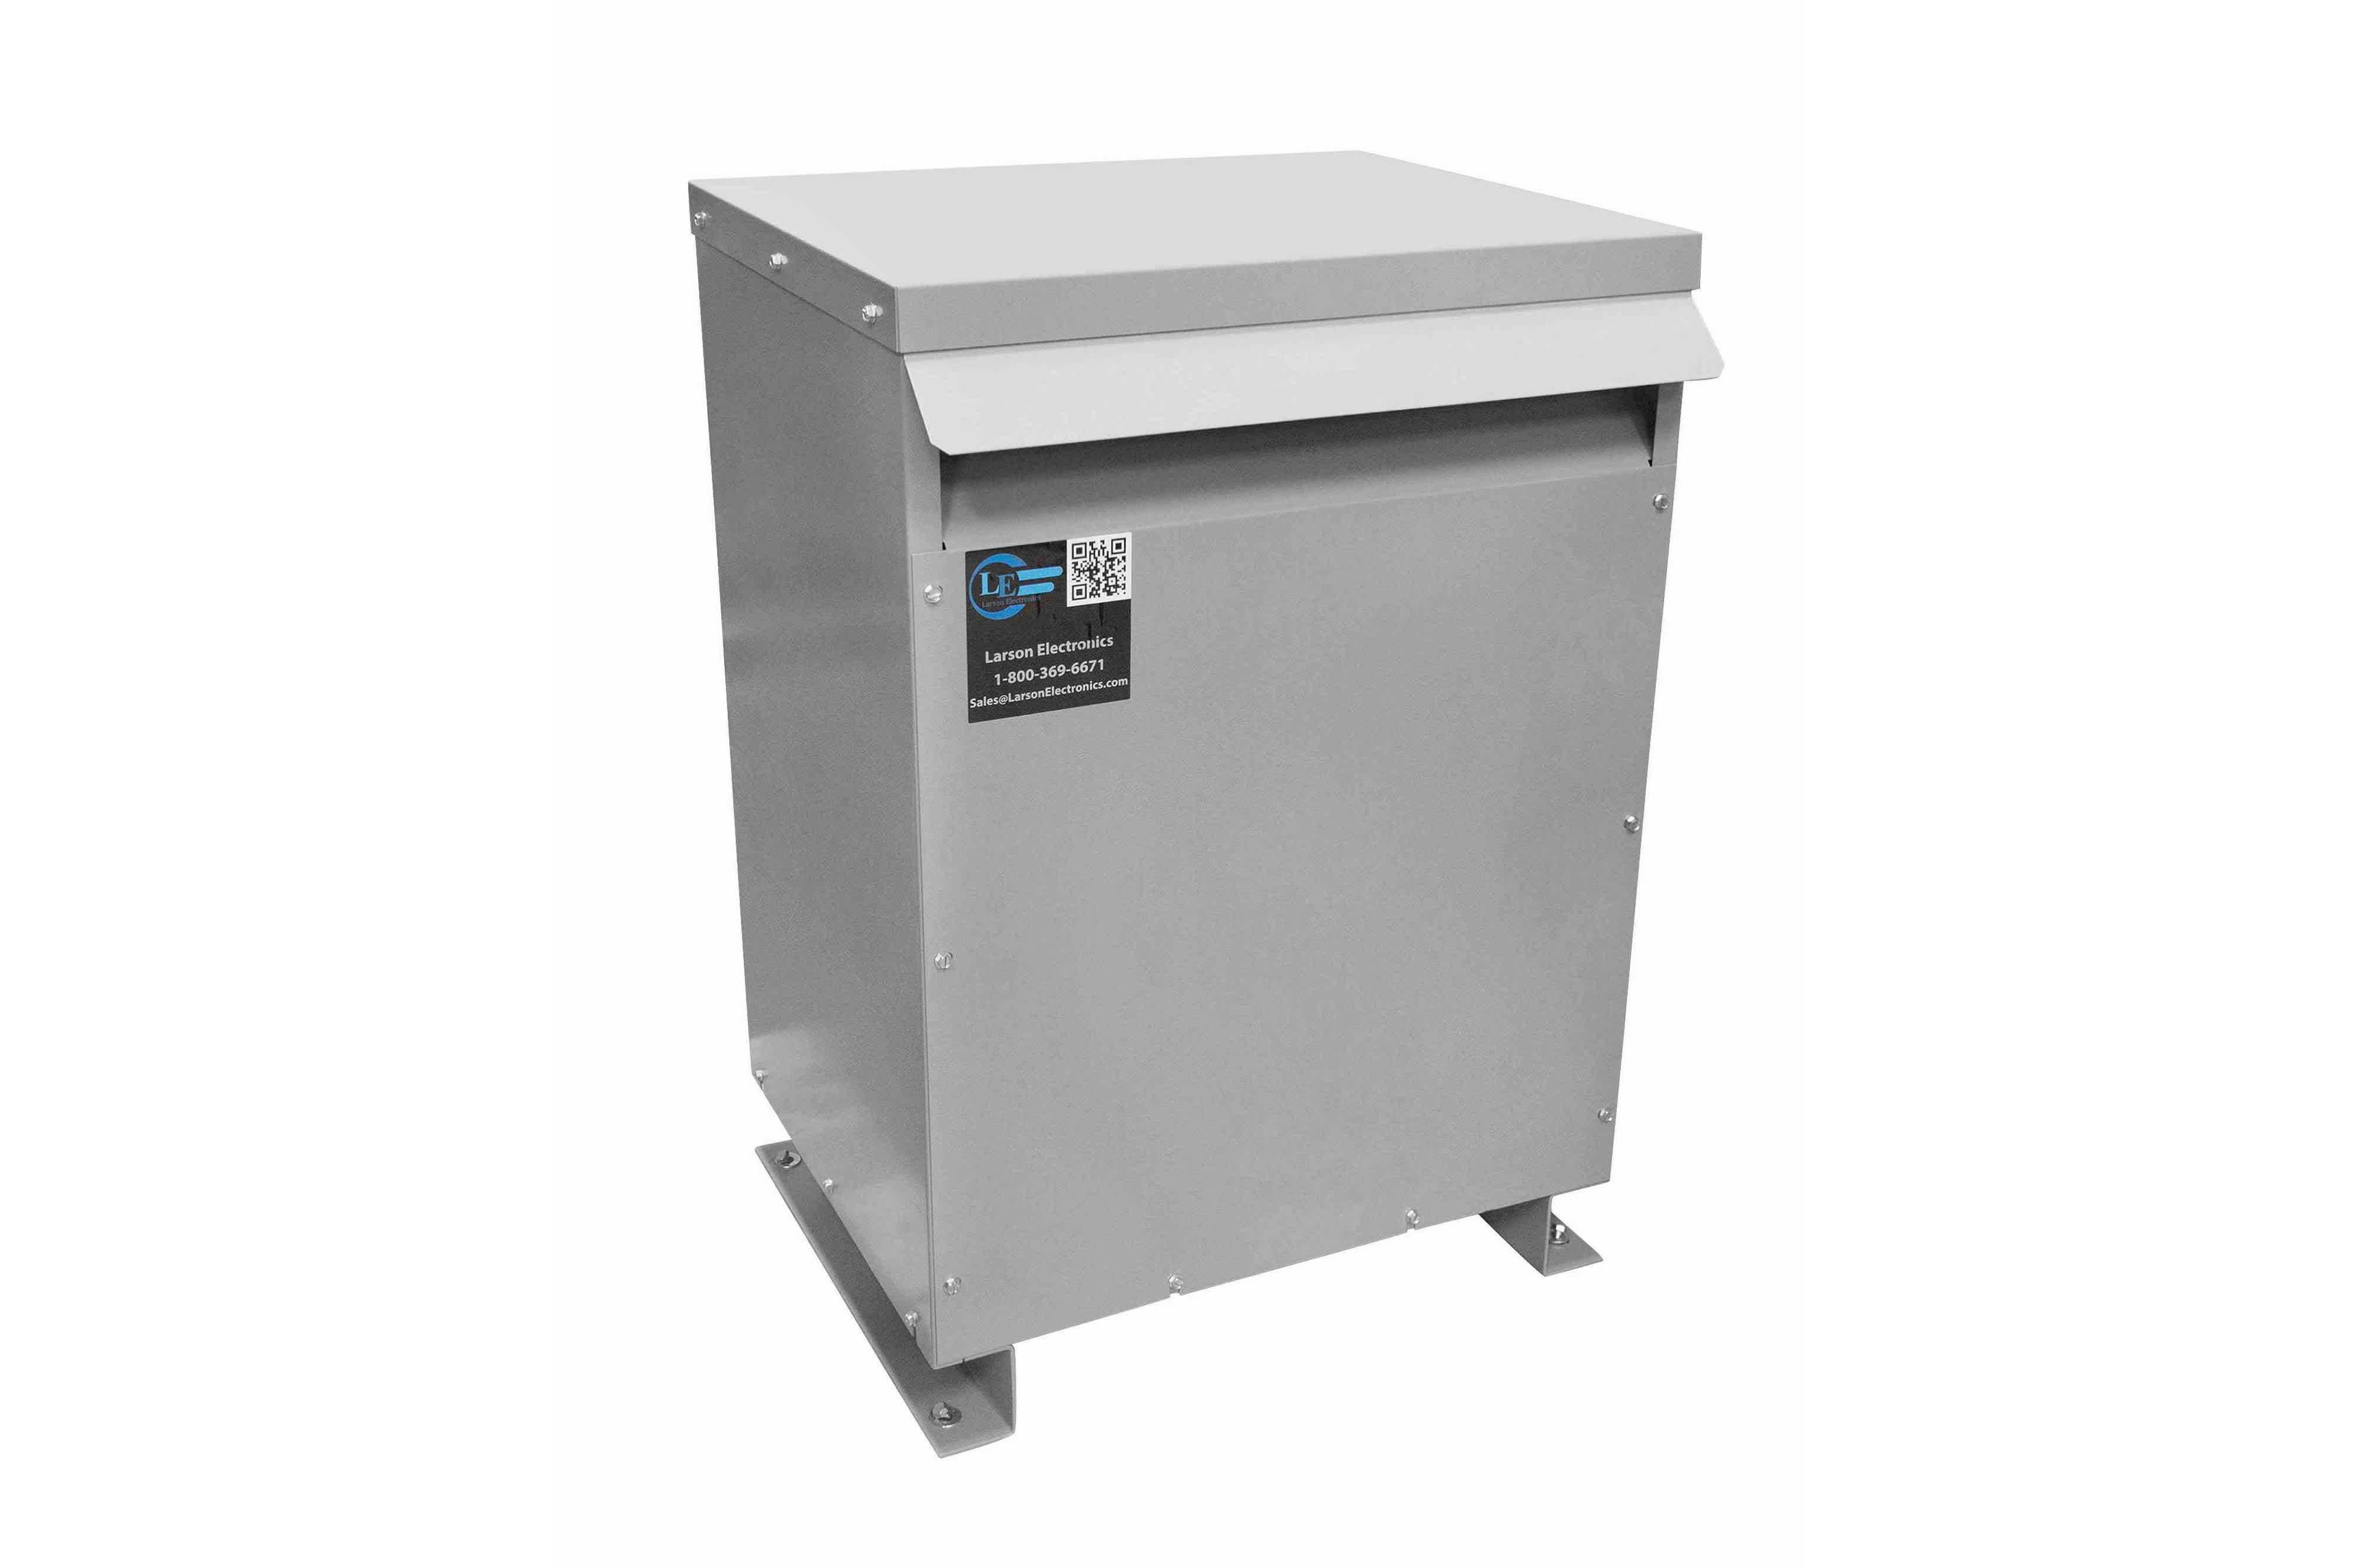 70 kVA 3PH Isolation Transformer, 600V Wye Primary, 400V Delta Secondary, N3R, Ventilated, 60 Hz